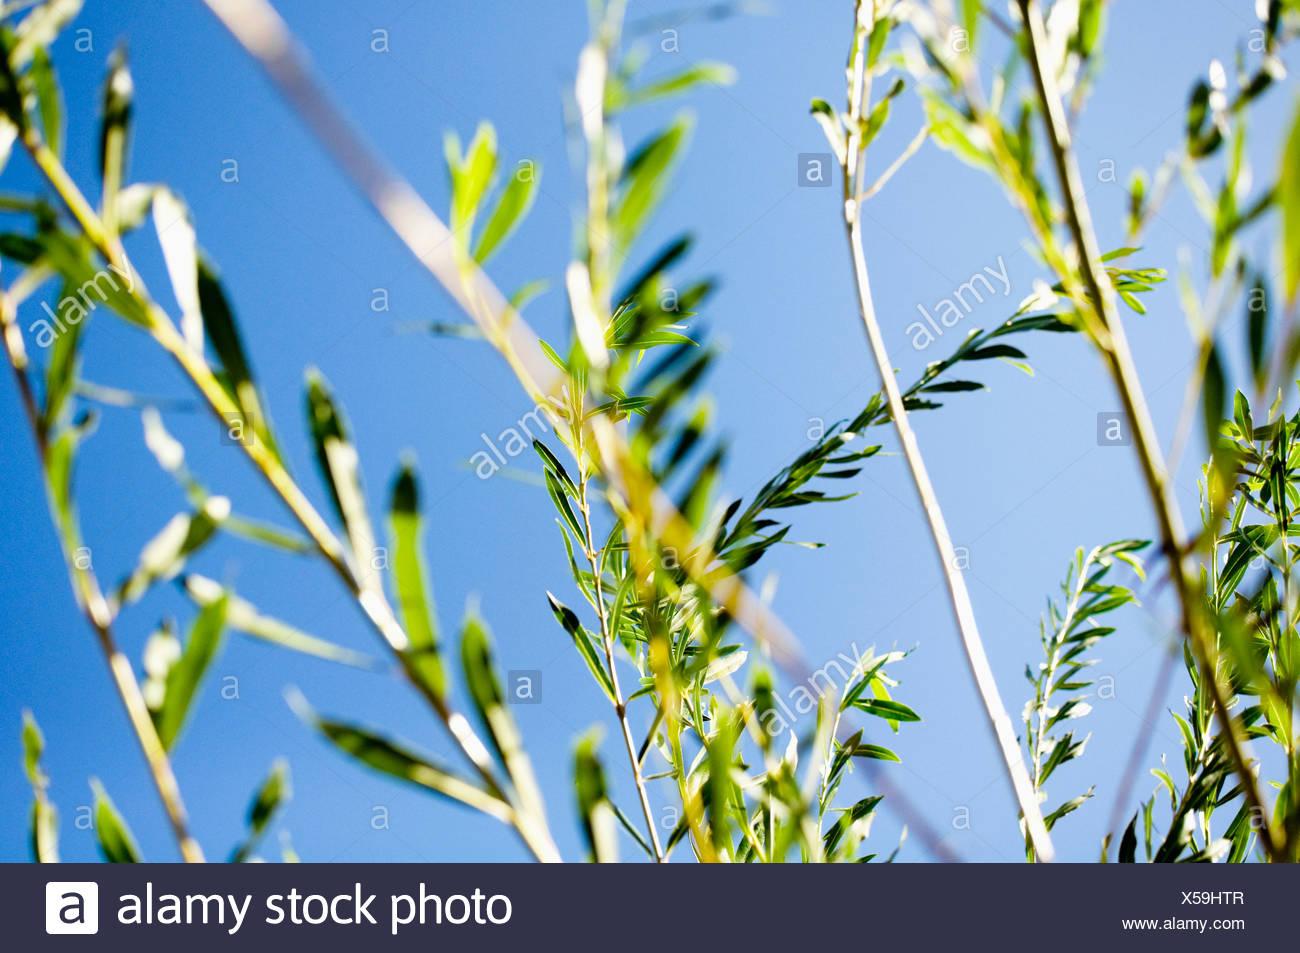 Closeup on vegetation - Stock Image